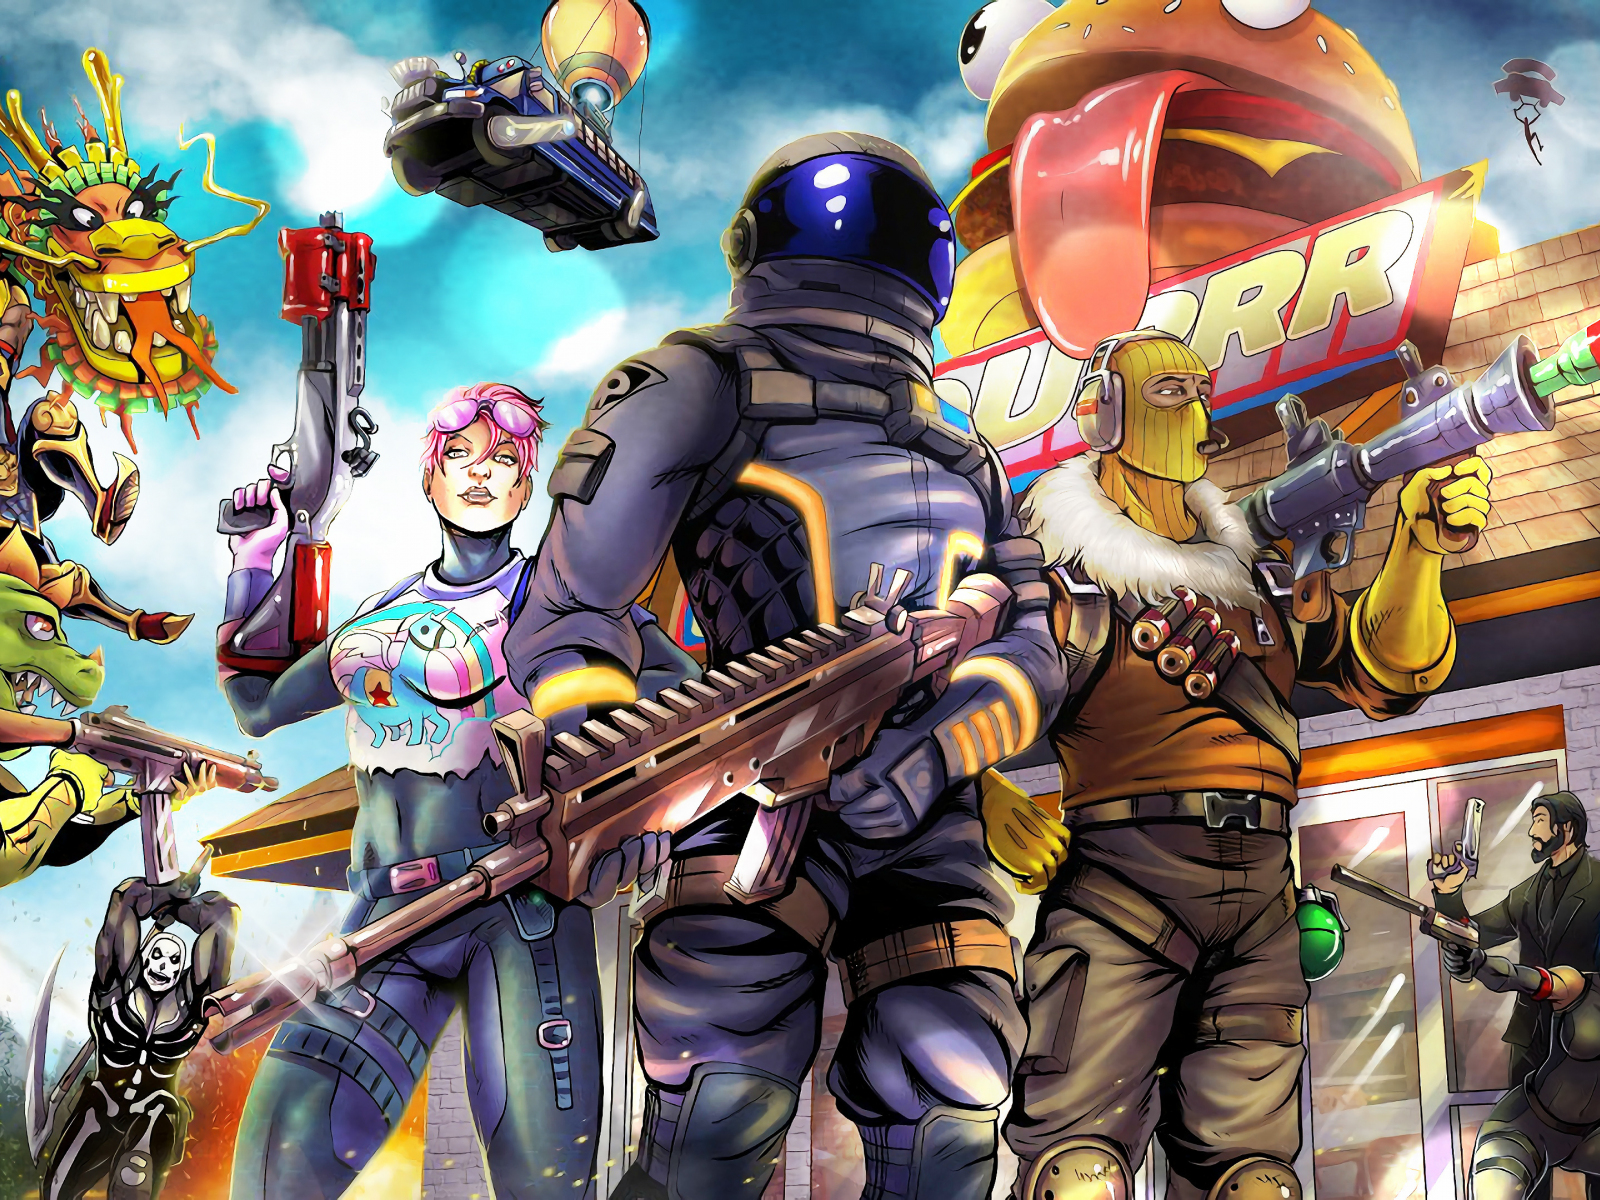 2018 video game fortnite art 1600x1200 wallpaper - fortnite pc 4 3